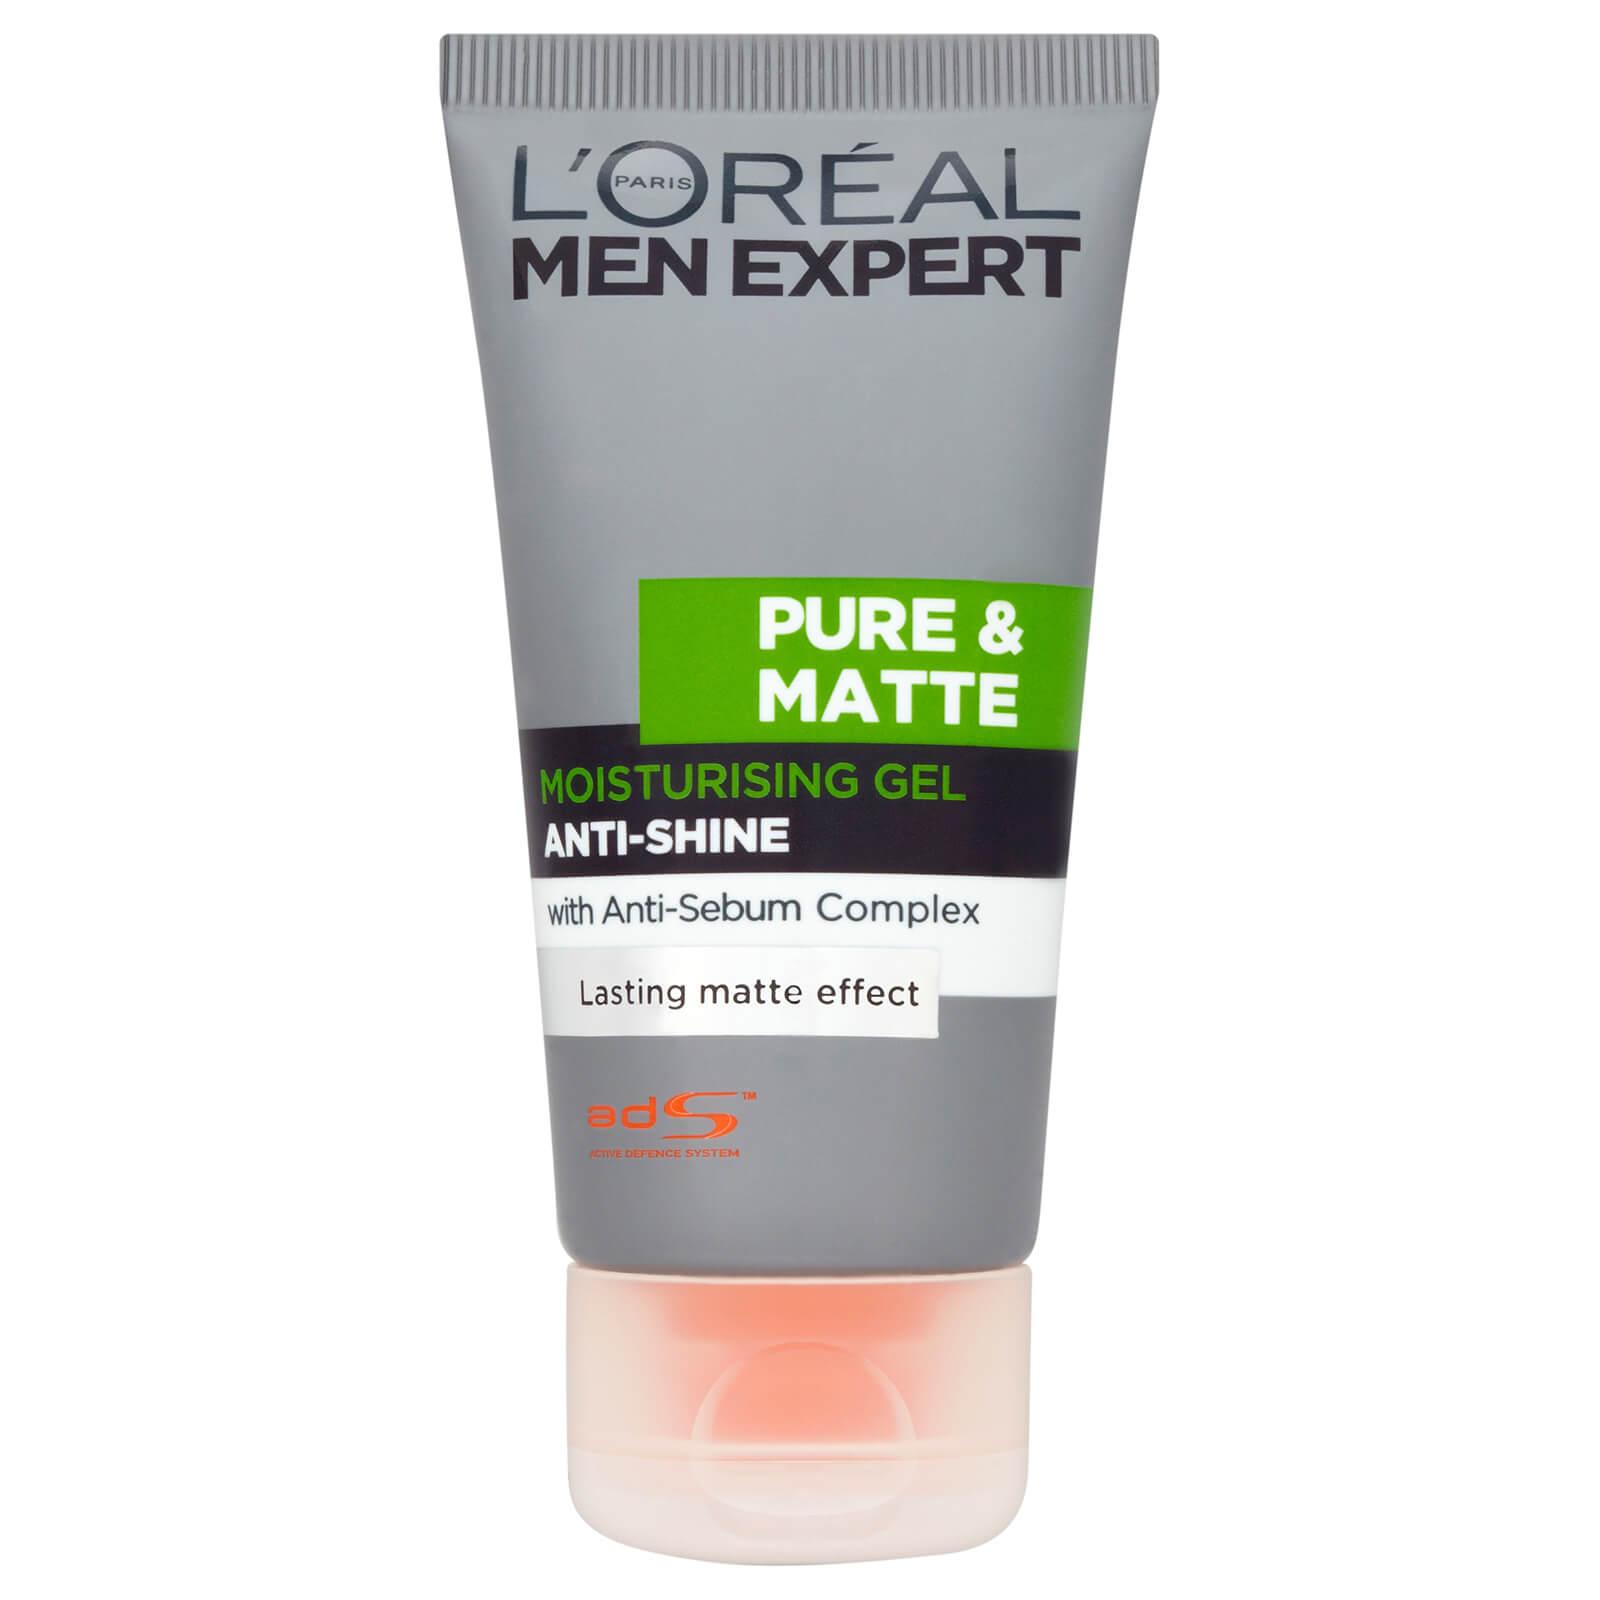 Купить Матирующий увлажняющий гель для мужчин L'Oréal Men Expert Pure & Matte Anti-Shine Moisturising Gel (50 мл)